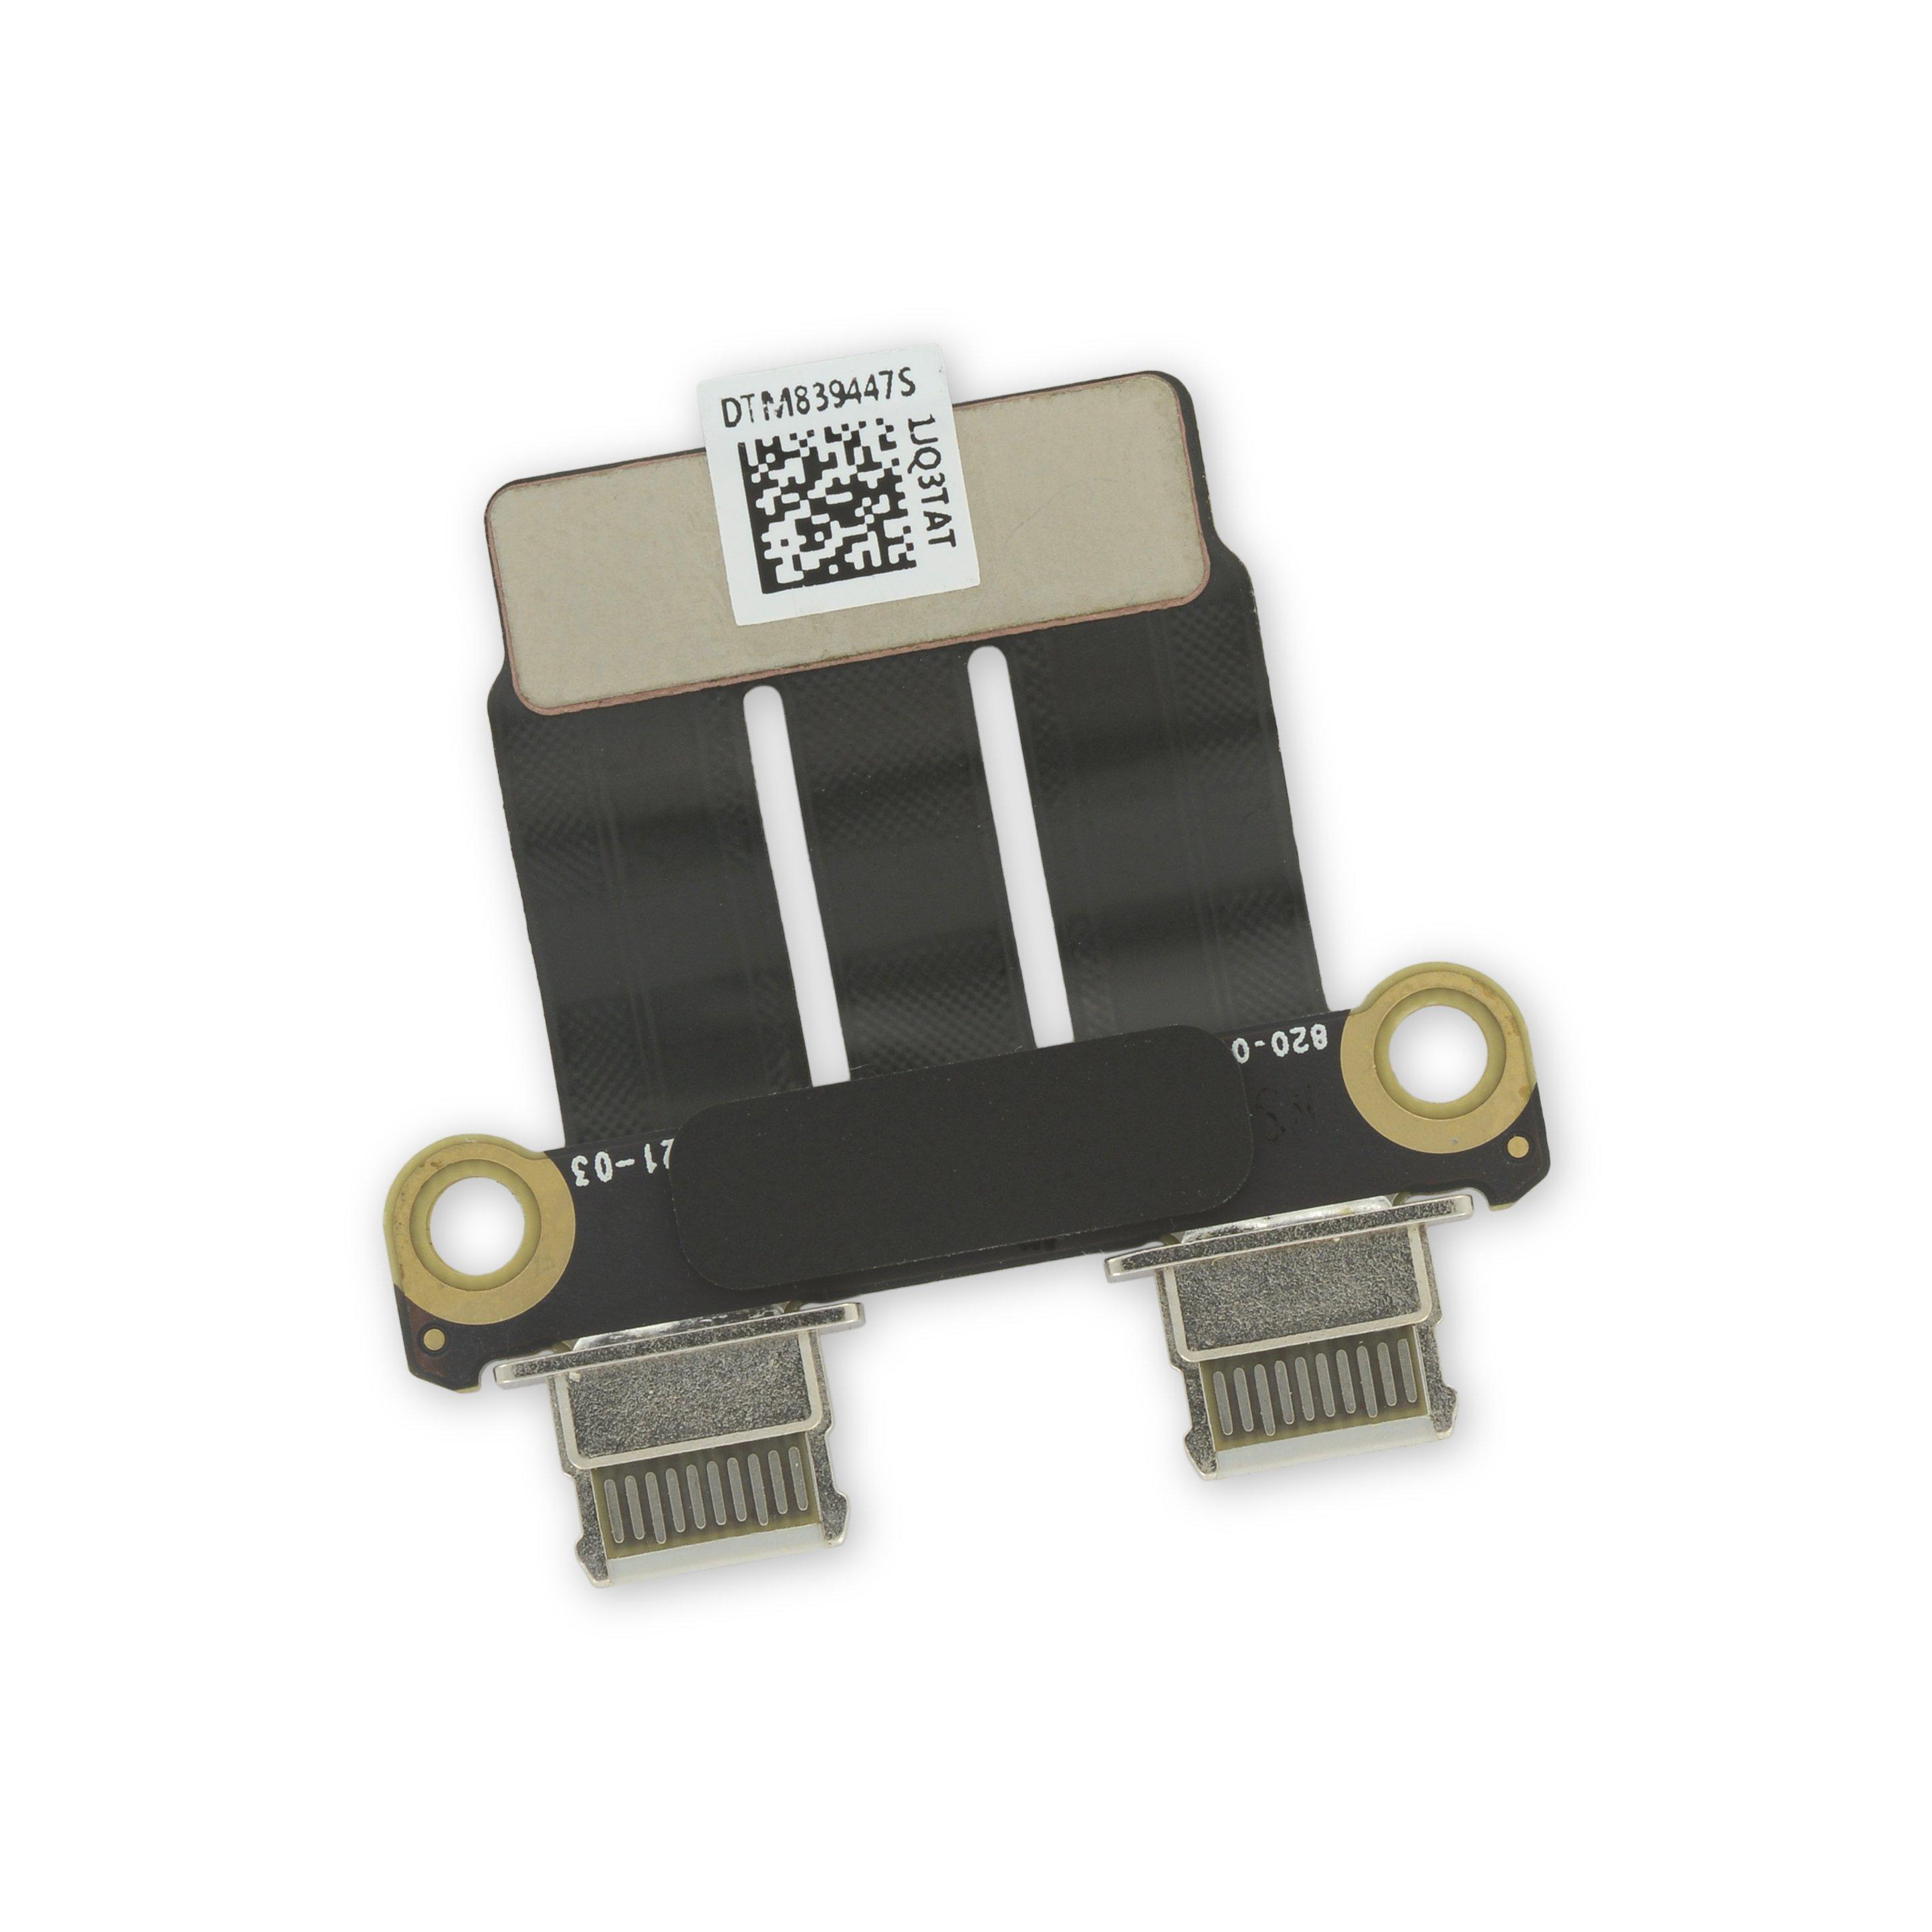 Immagine MacBook Pro (A1989, A1990, A2289, A2141 Mid 2018-2020) USB-C Board